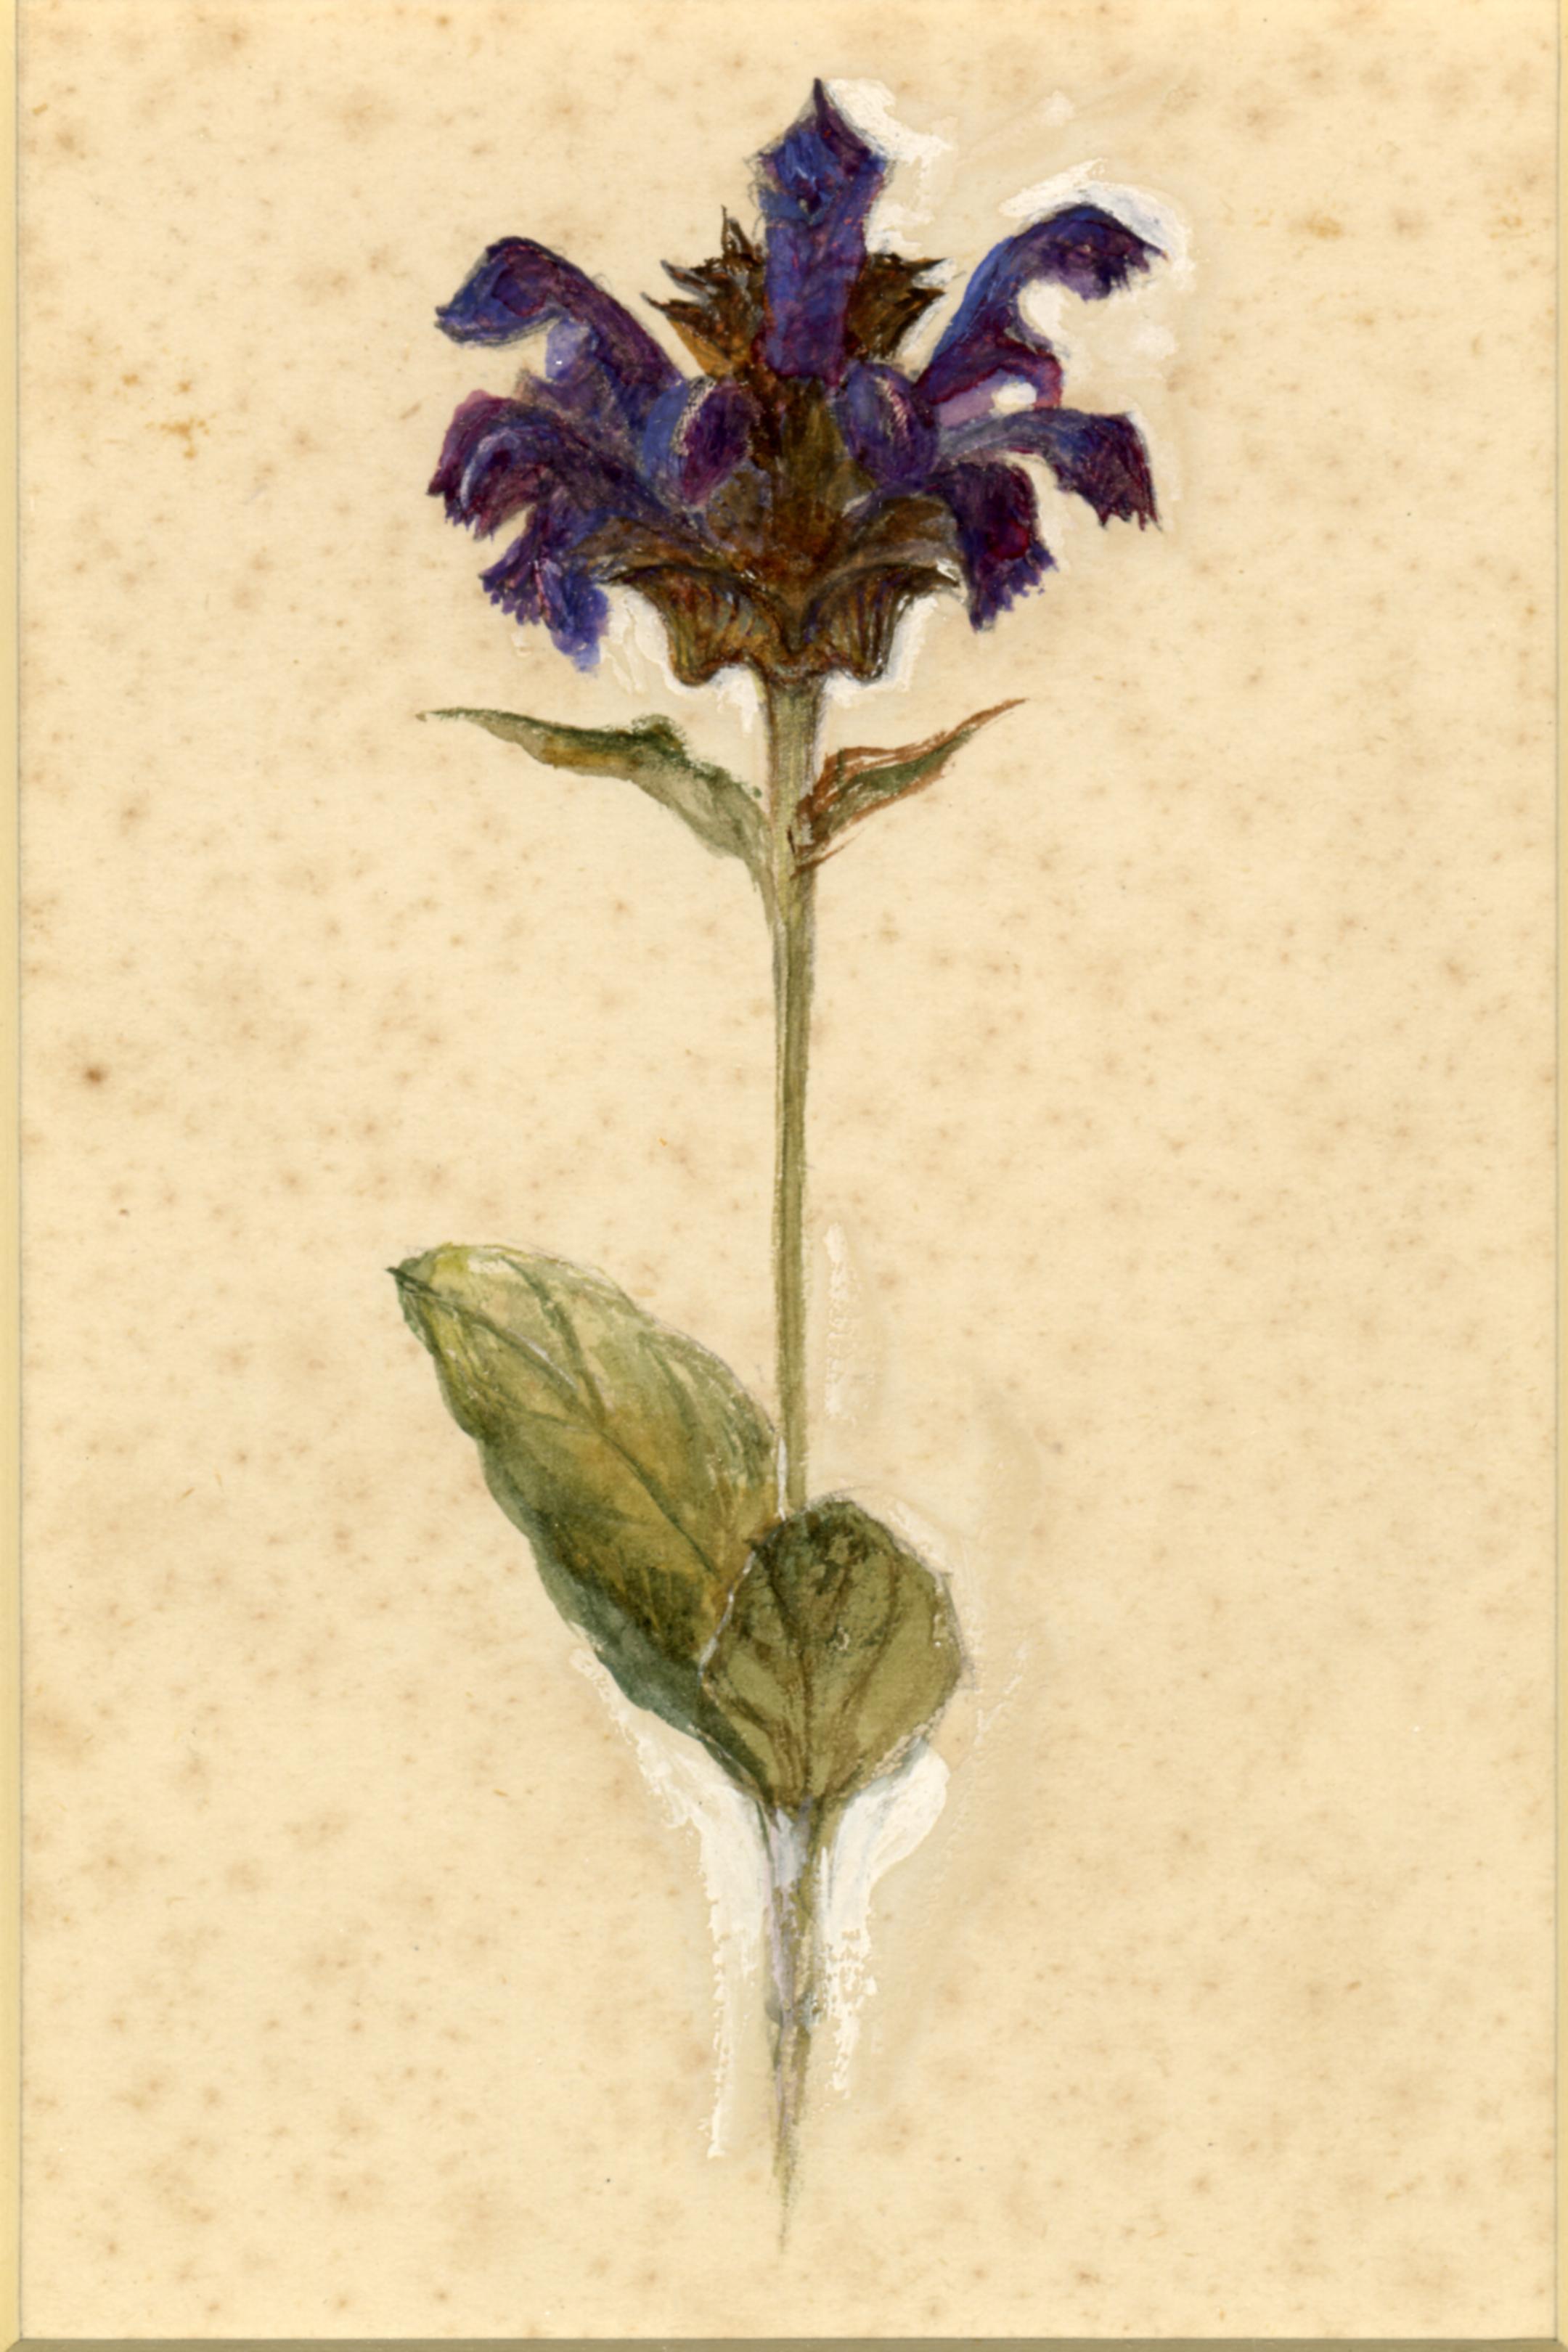 John Ruskin, Flower studies: Common Self-heal, RF1270,  © Ruskin Foundation